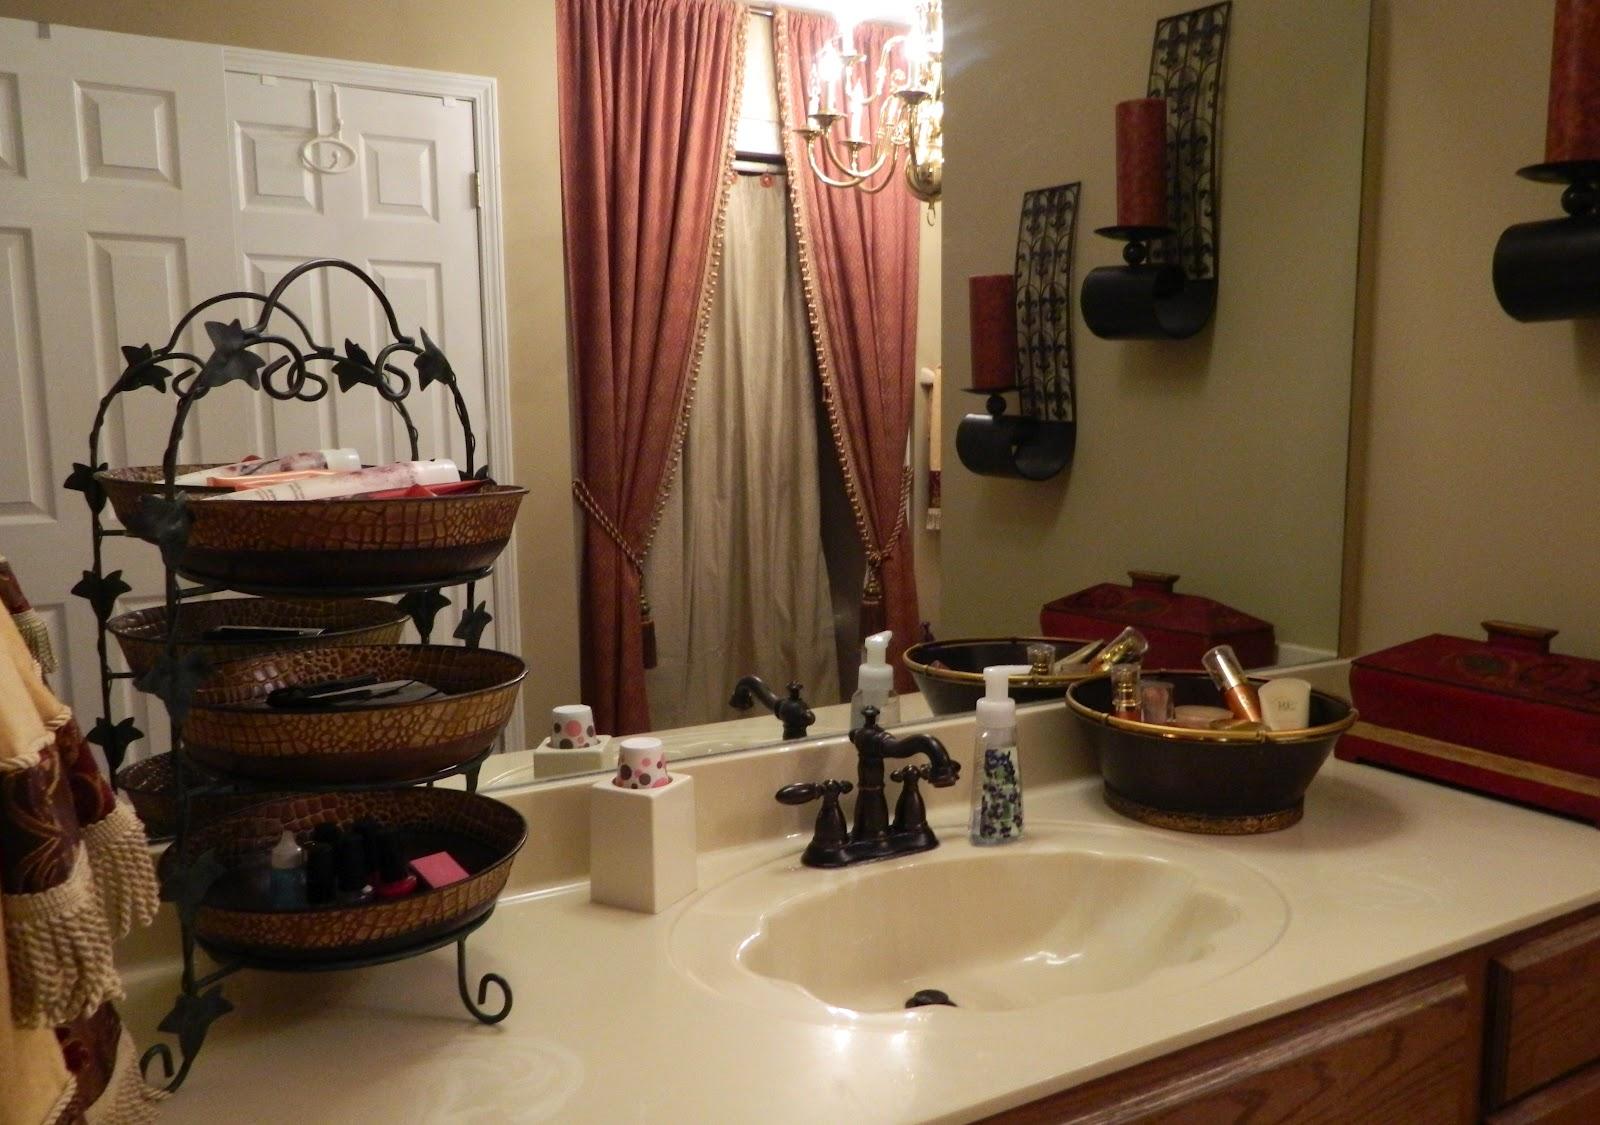 Sugar Spice and Spilled Milk Mission Organization Week 14  My Bathroom Countertop